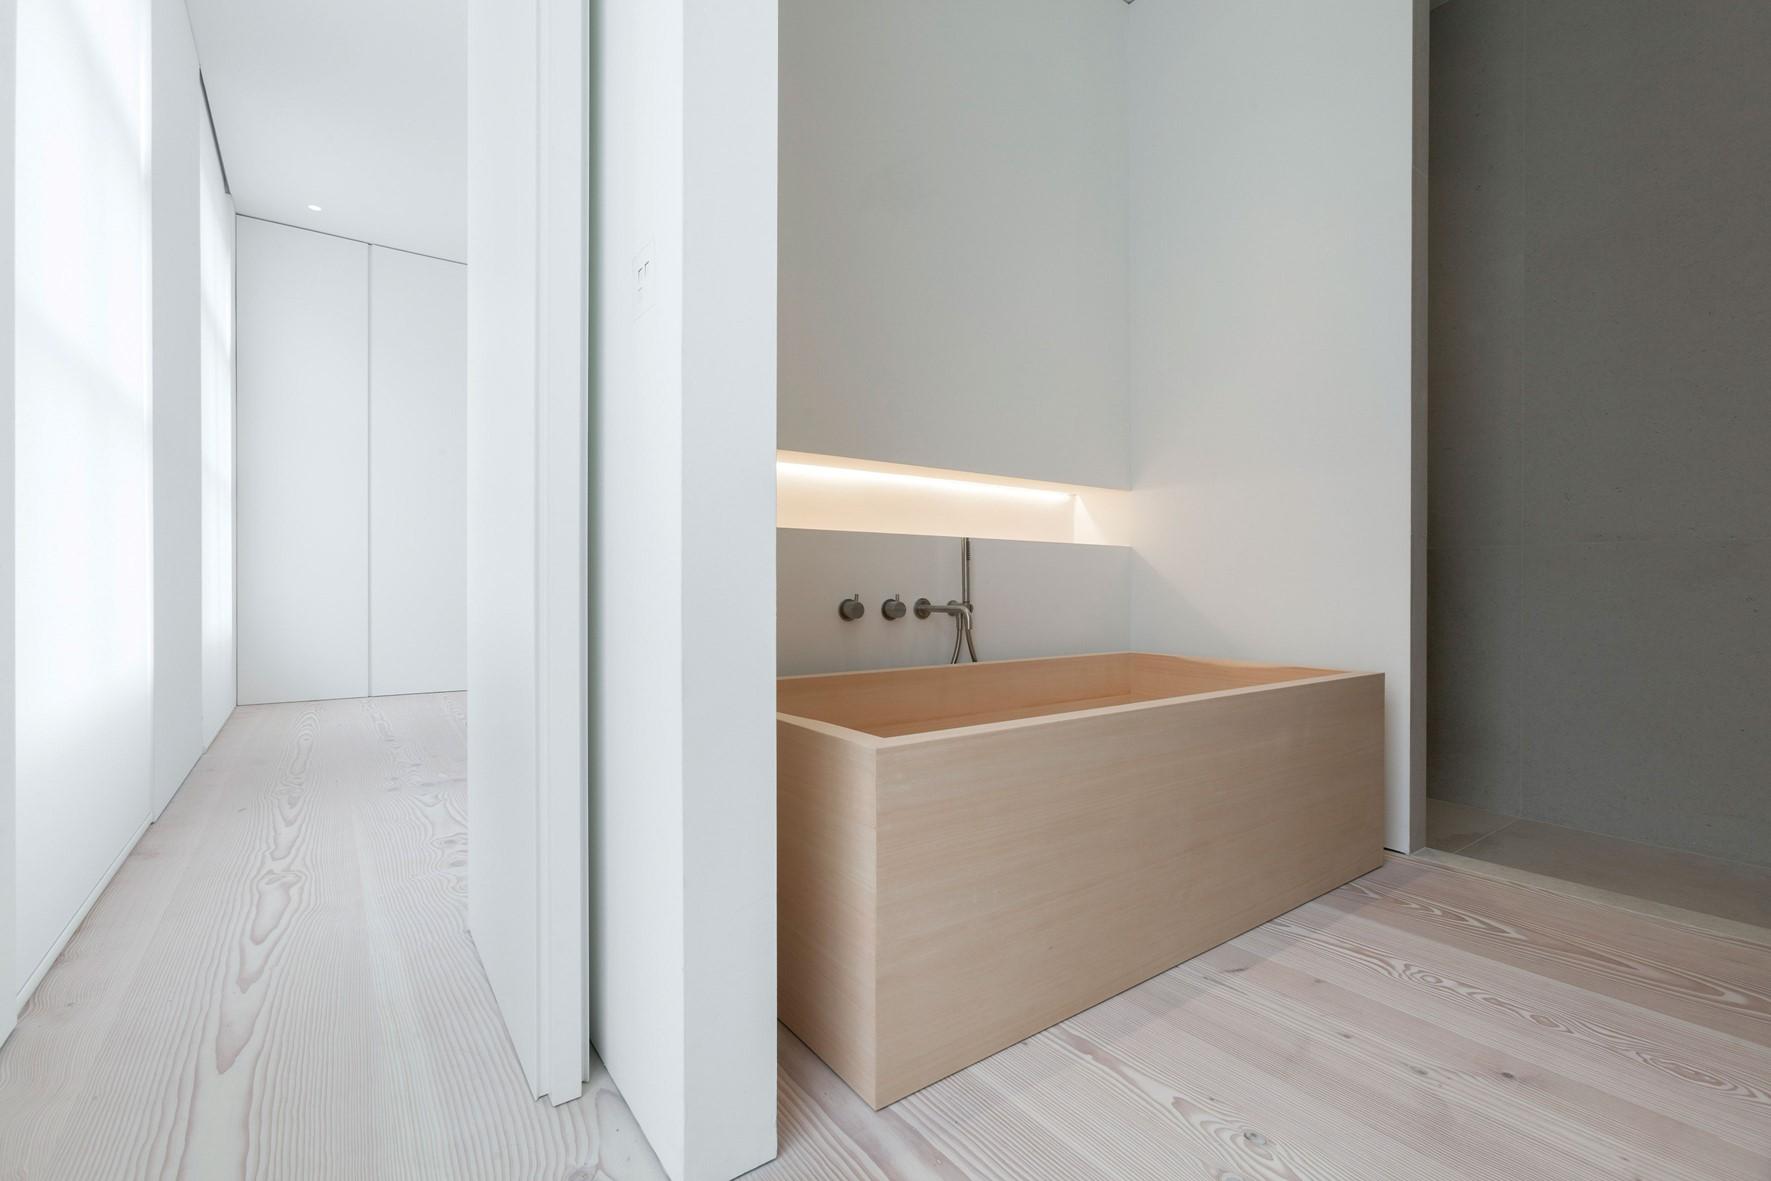 douglas-plank-floor_lye-and-natural-oil_coach-house-amsterdam_bathroom_dinesen.jpg